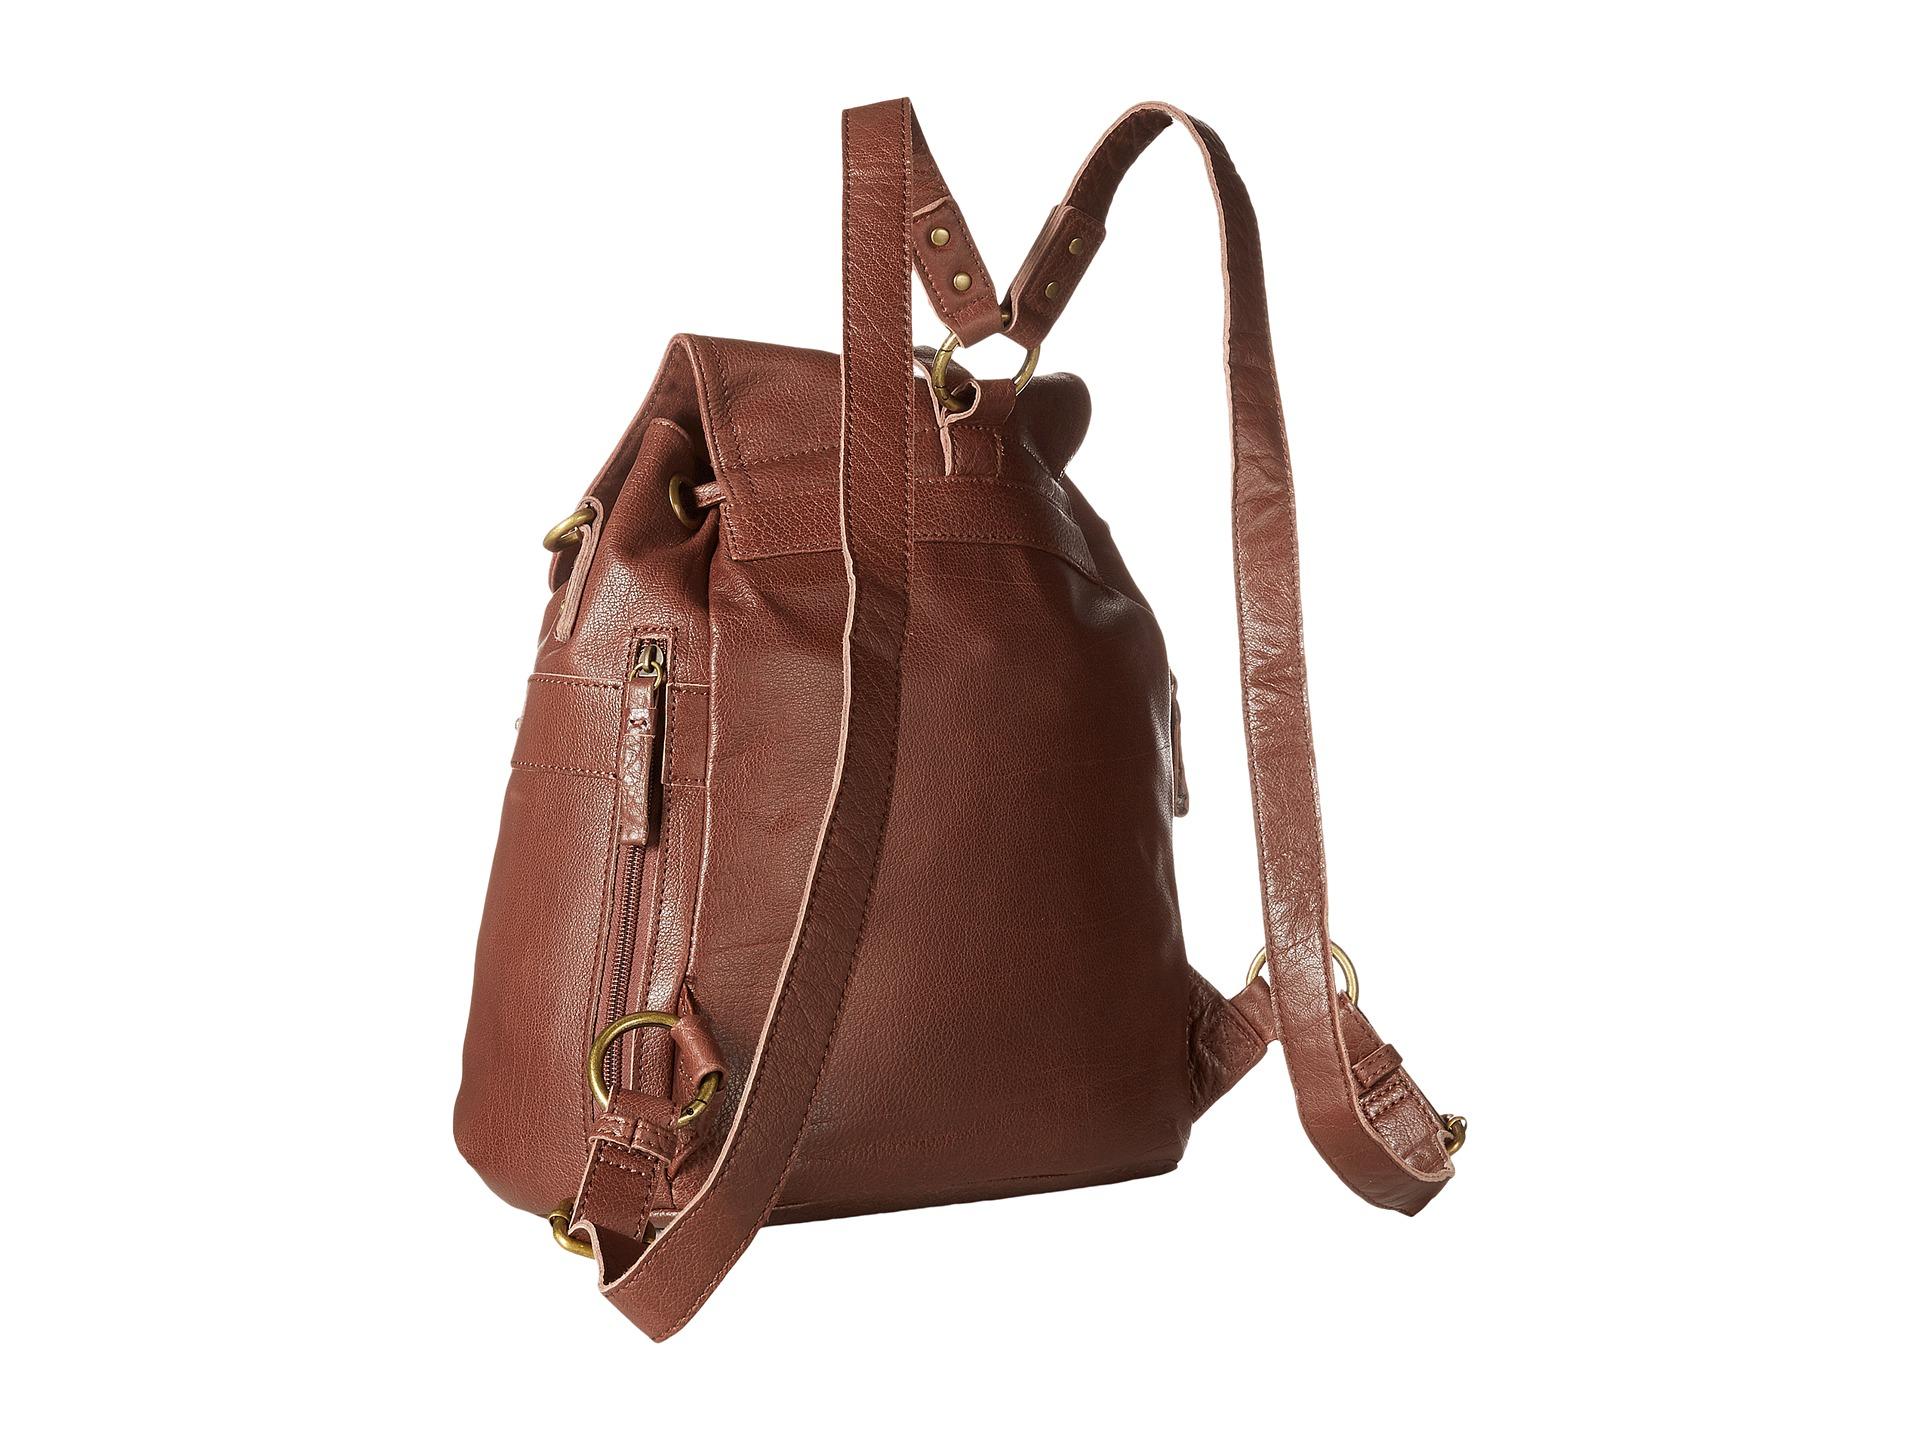 bdd31bac9 The Sak Mariposa Convertible Backpack in Brown - Lyst